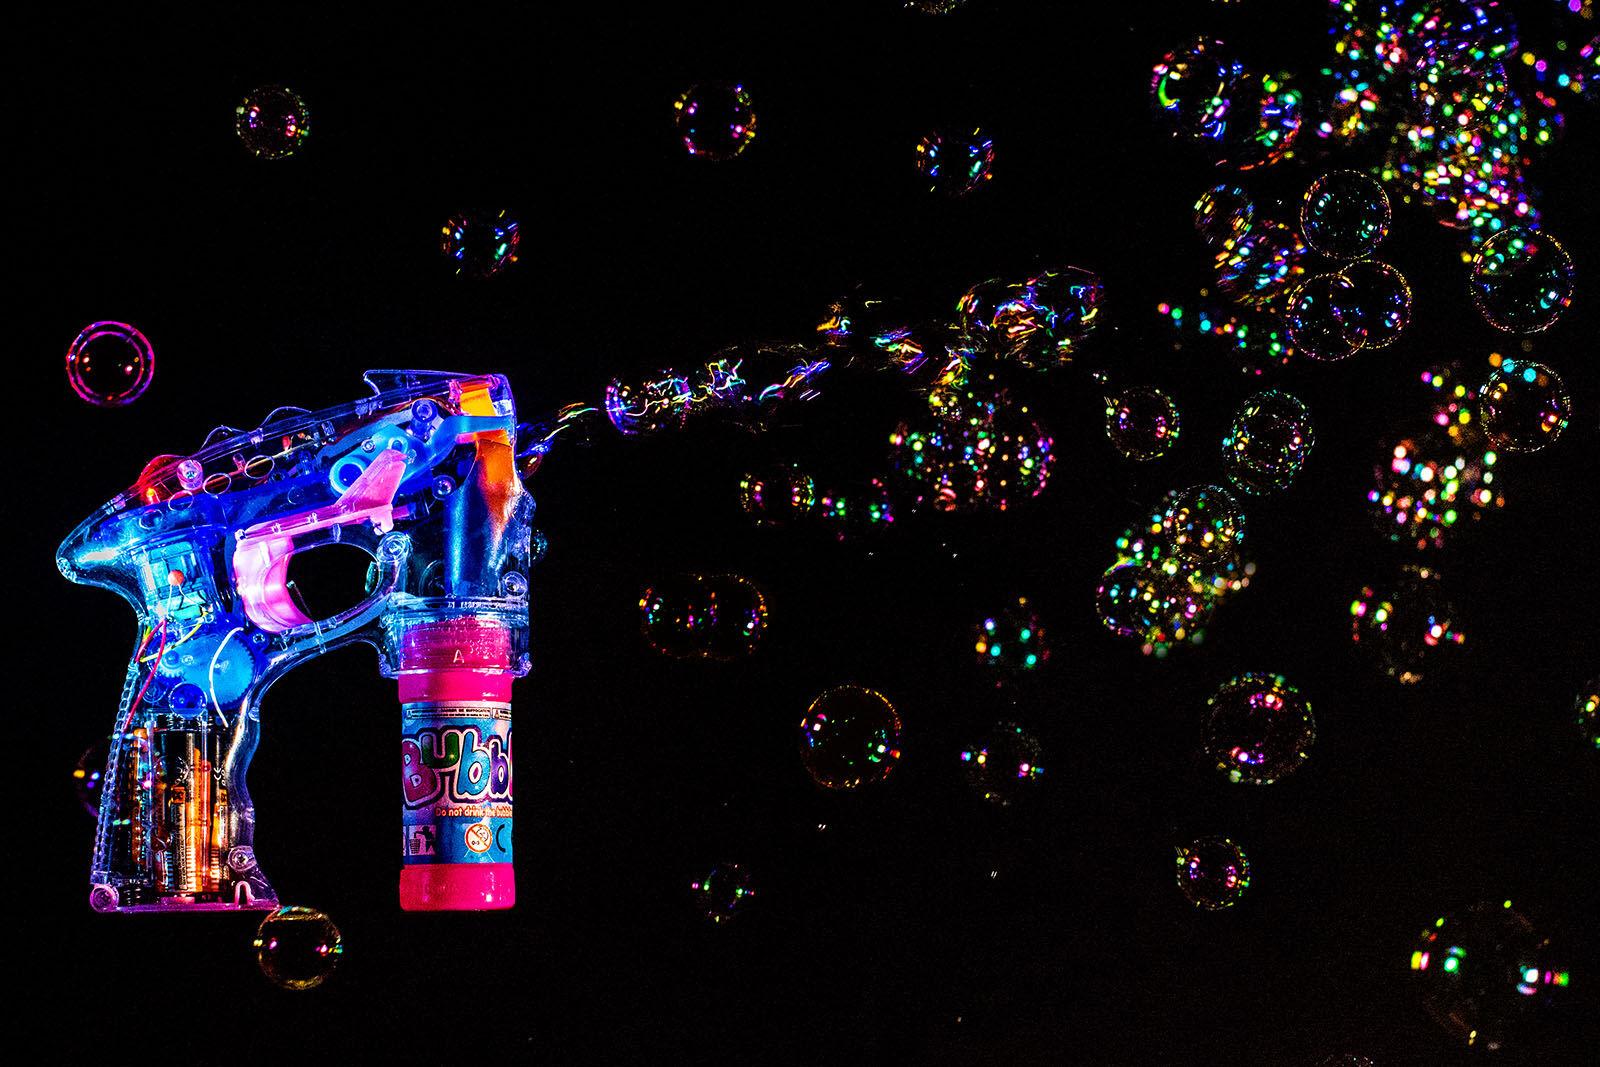 Bubble machine party poster.